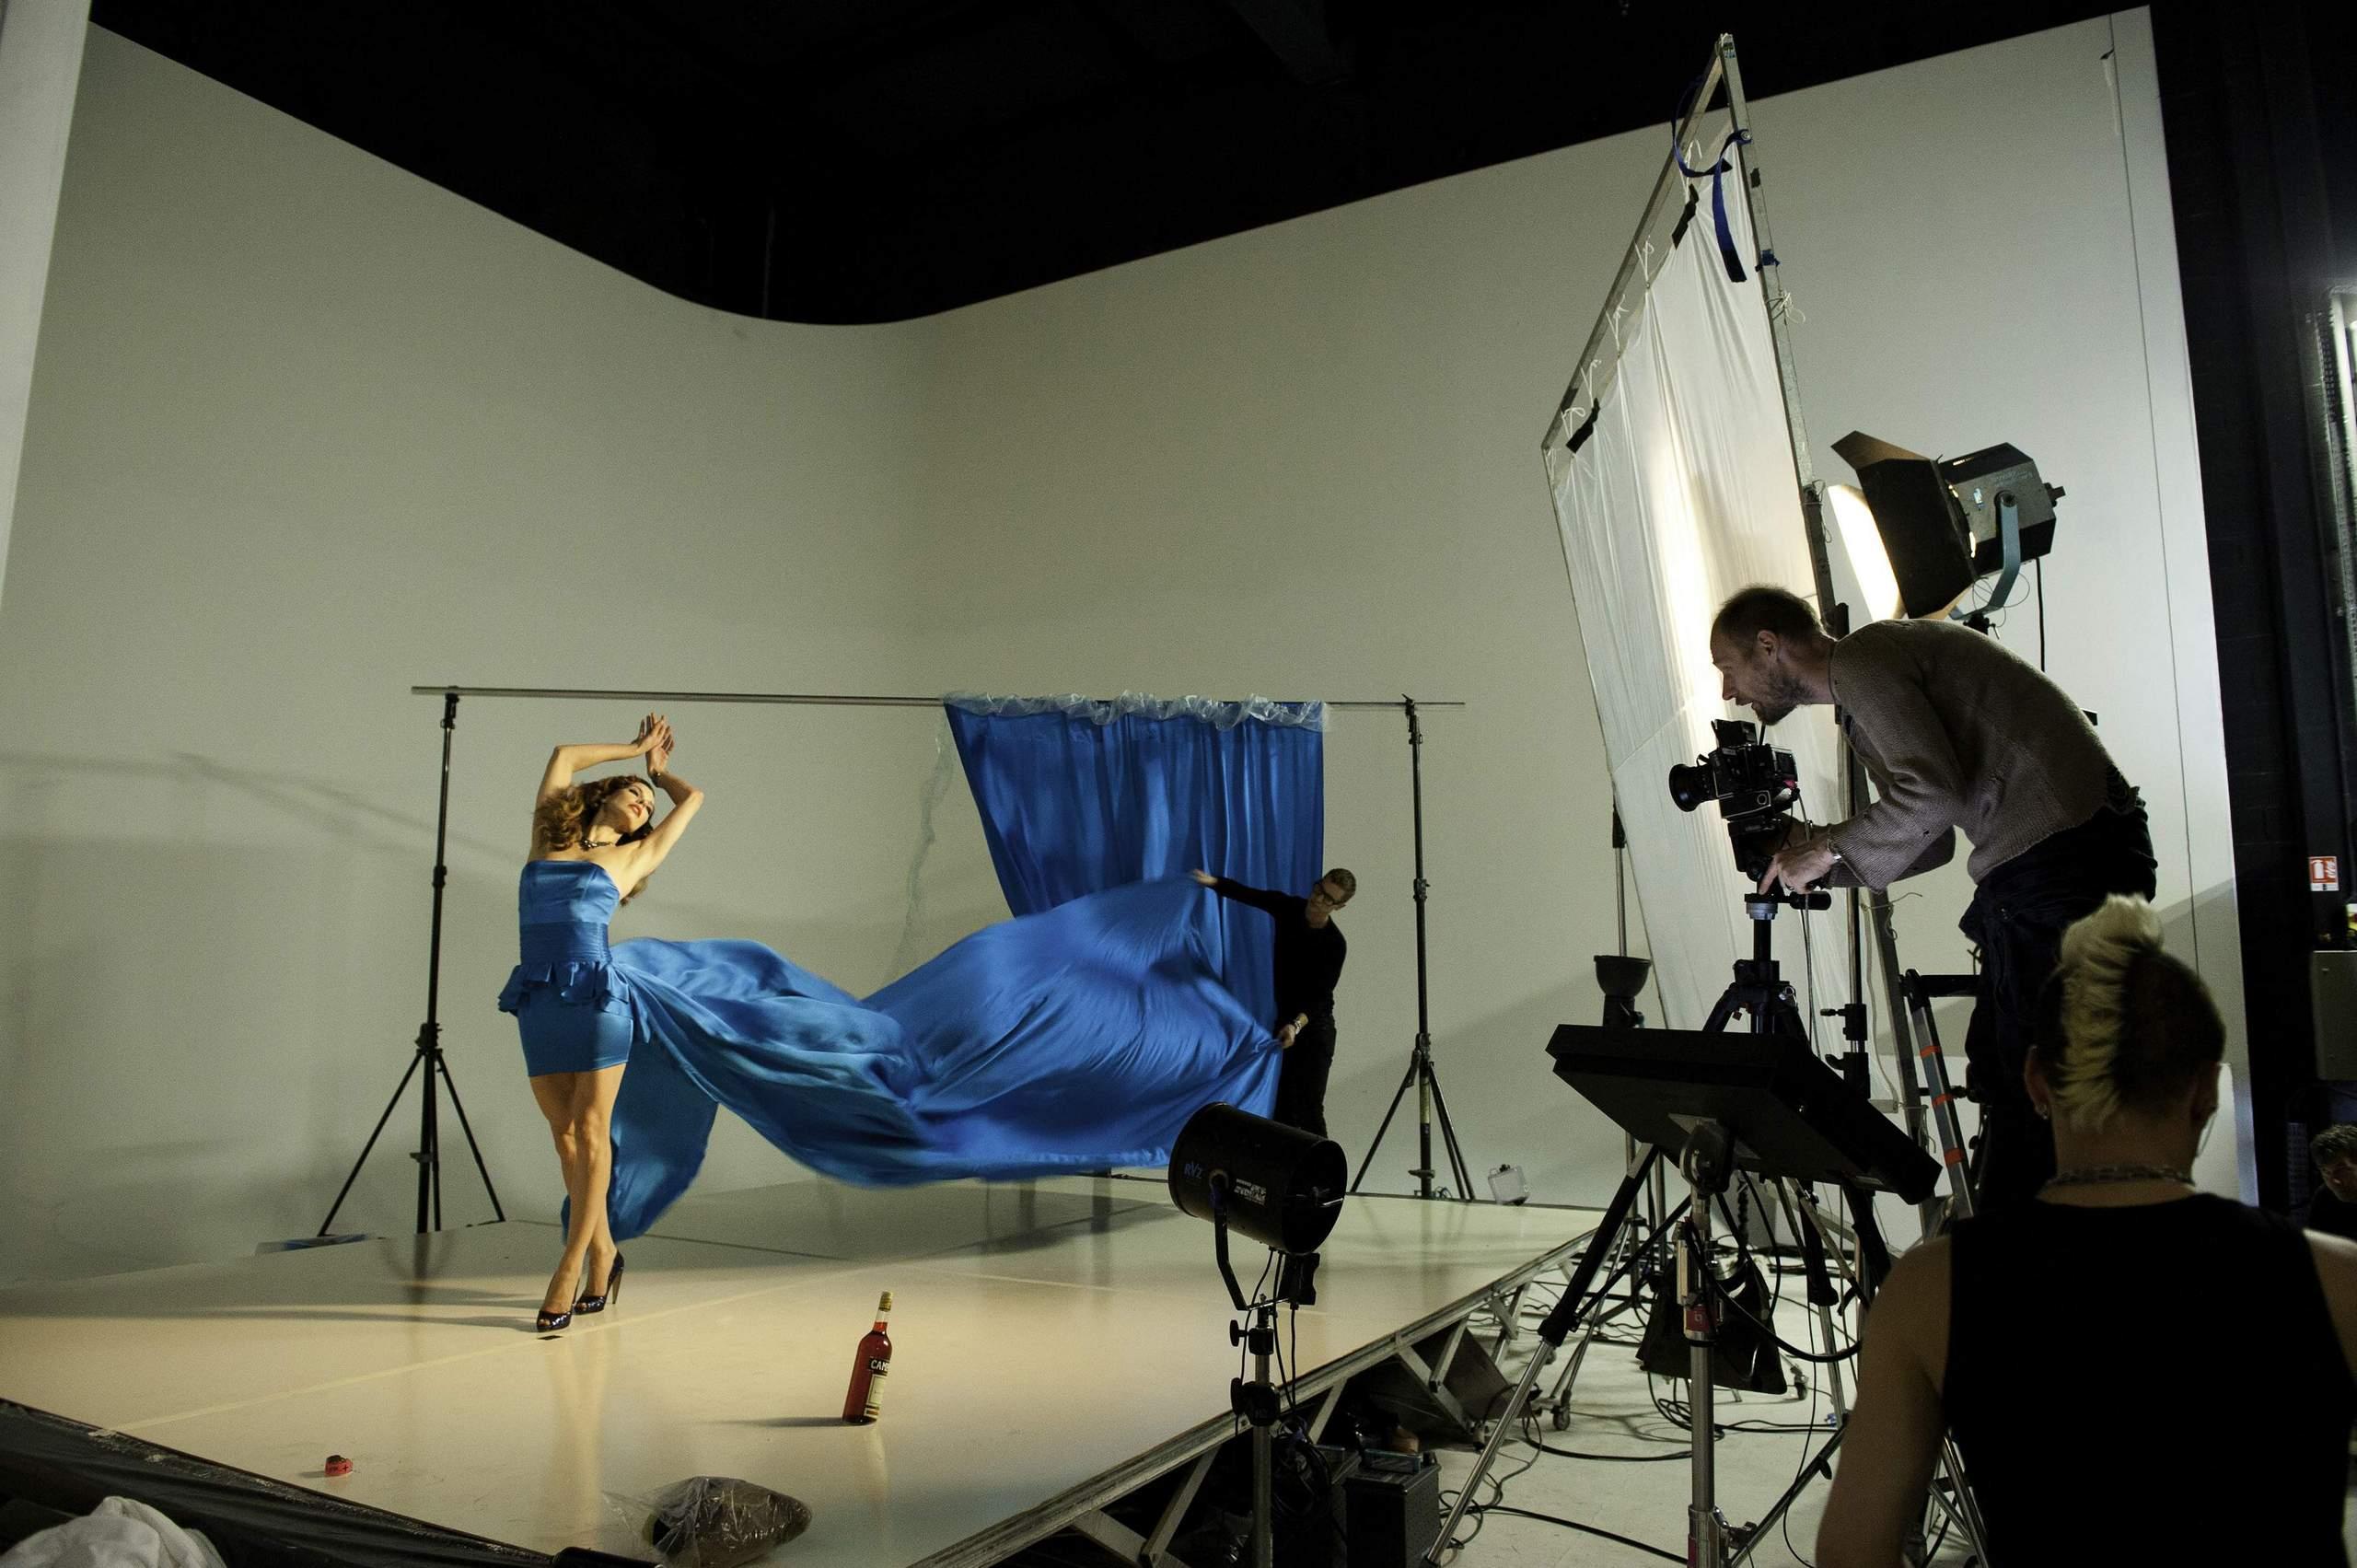 Photoshoot behind the scenes Milla Jovovich